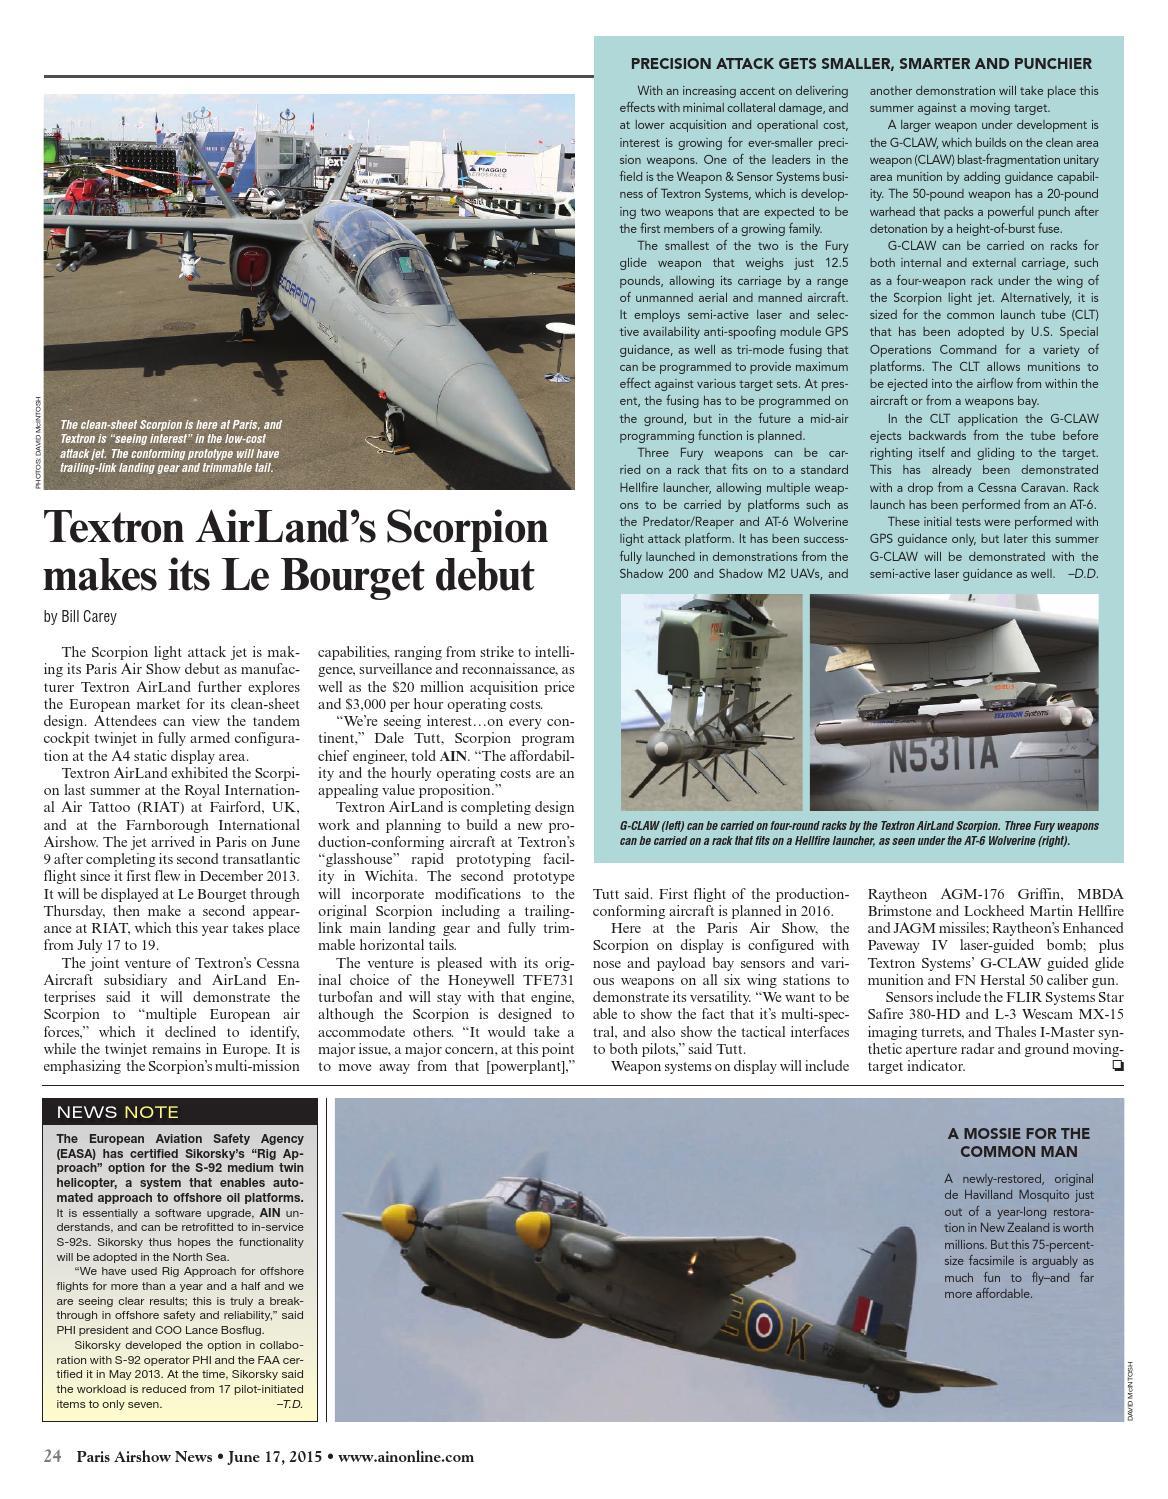 Textron Scorpion Jet News: Paris Airshow News 06-17-15 By Aviation International News